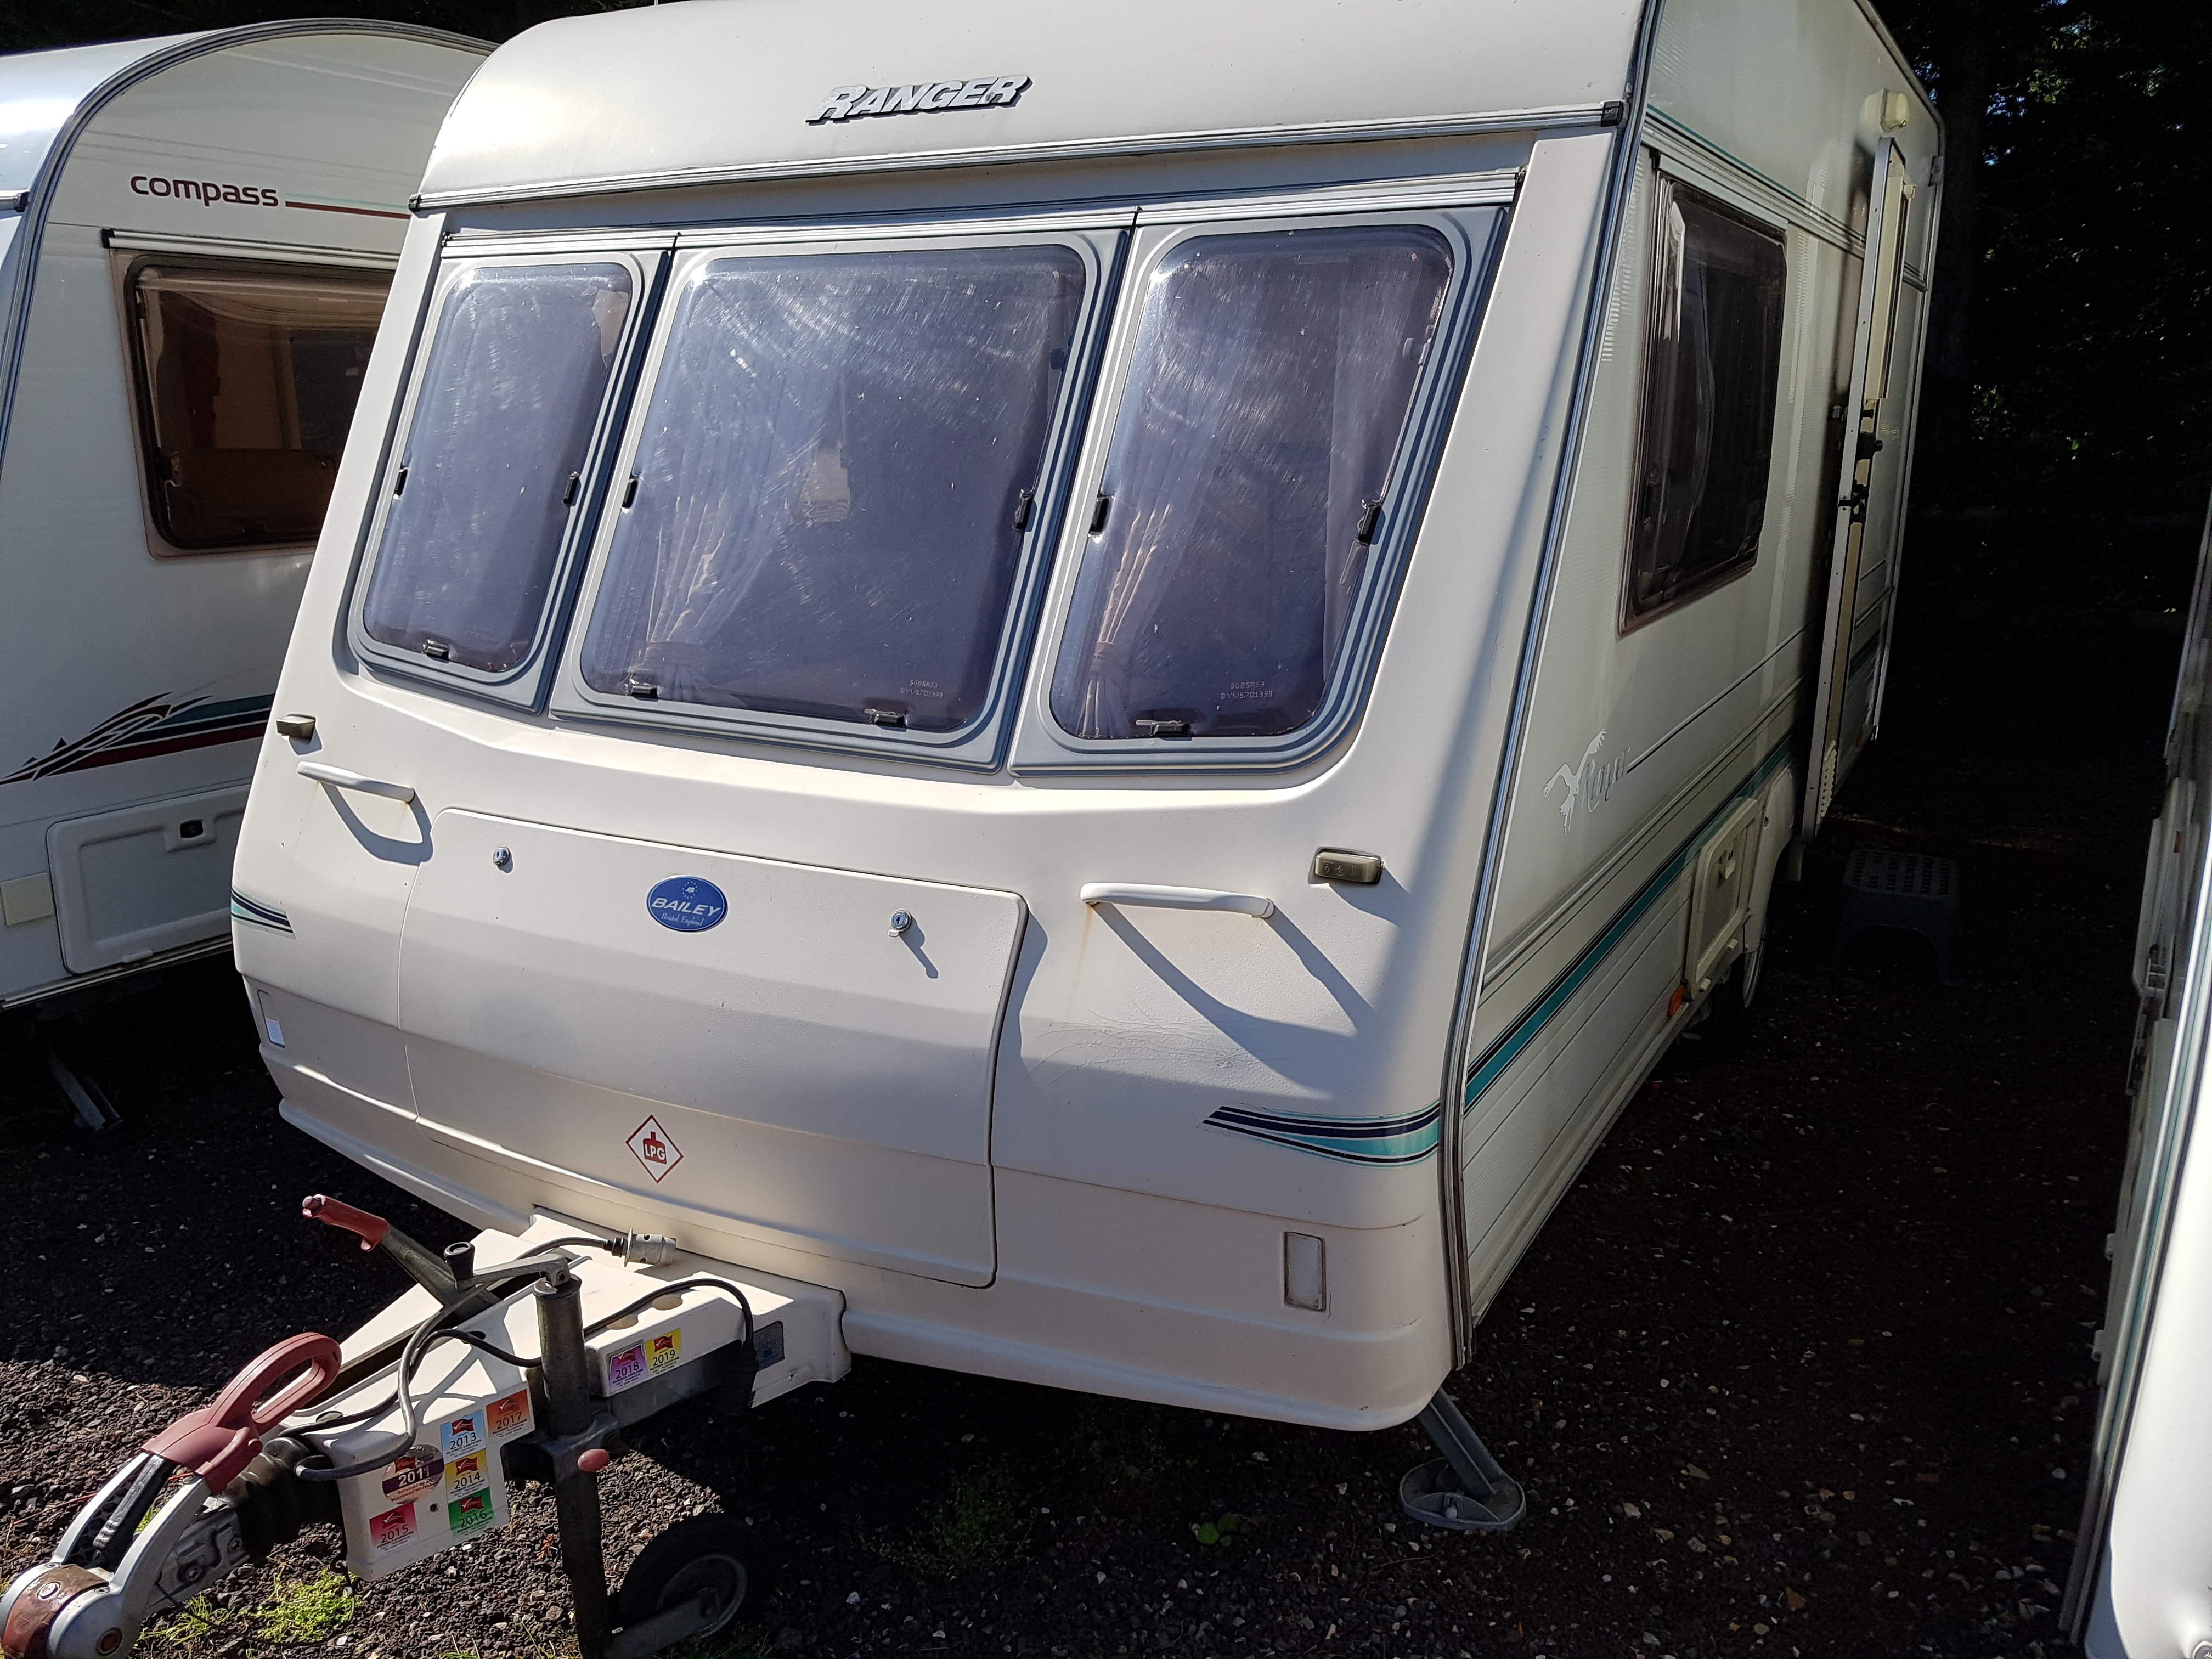 1997 Bailey Ranger 450-2 2 Berth End Washroom Caravan with